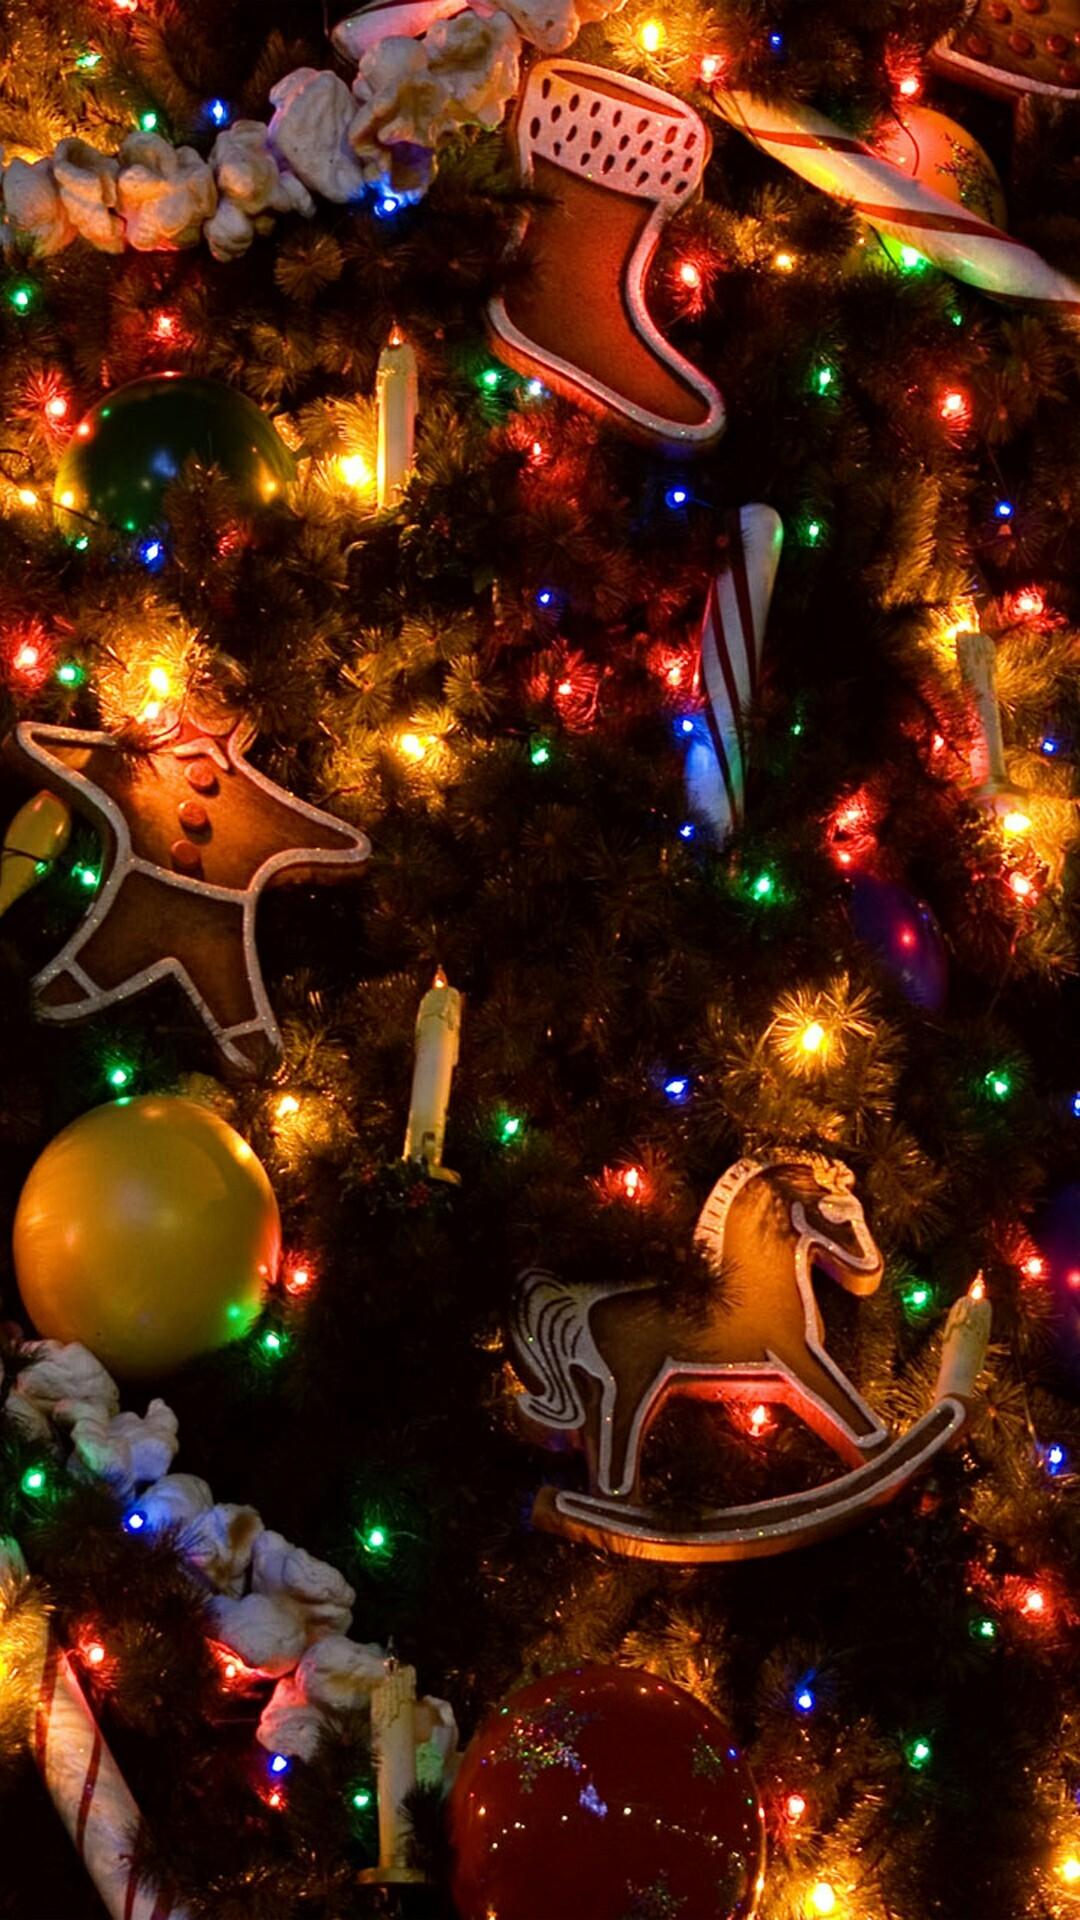 Christmas Backgrounds For Desktop